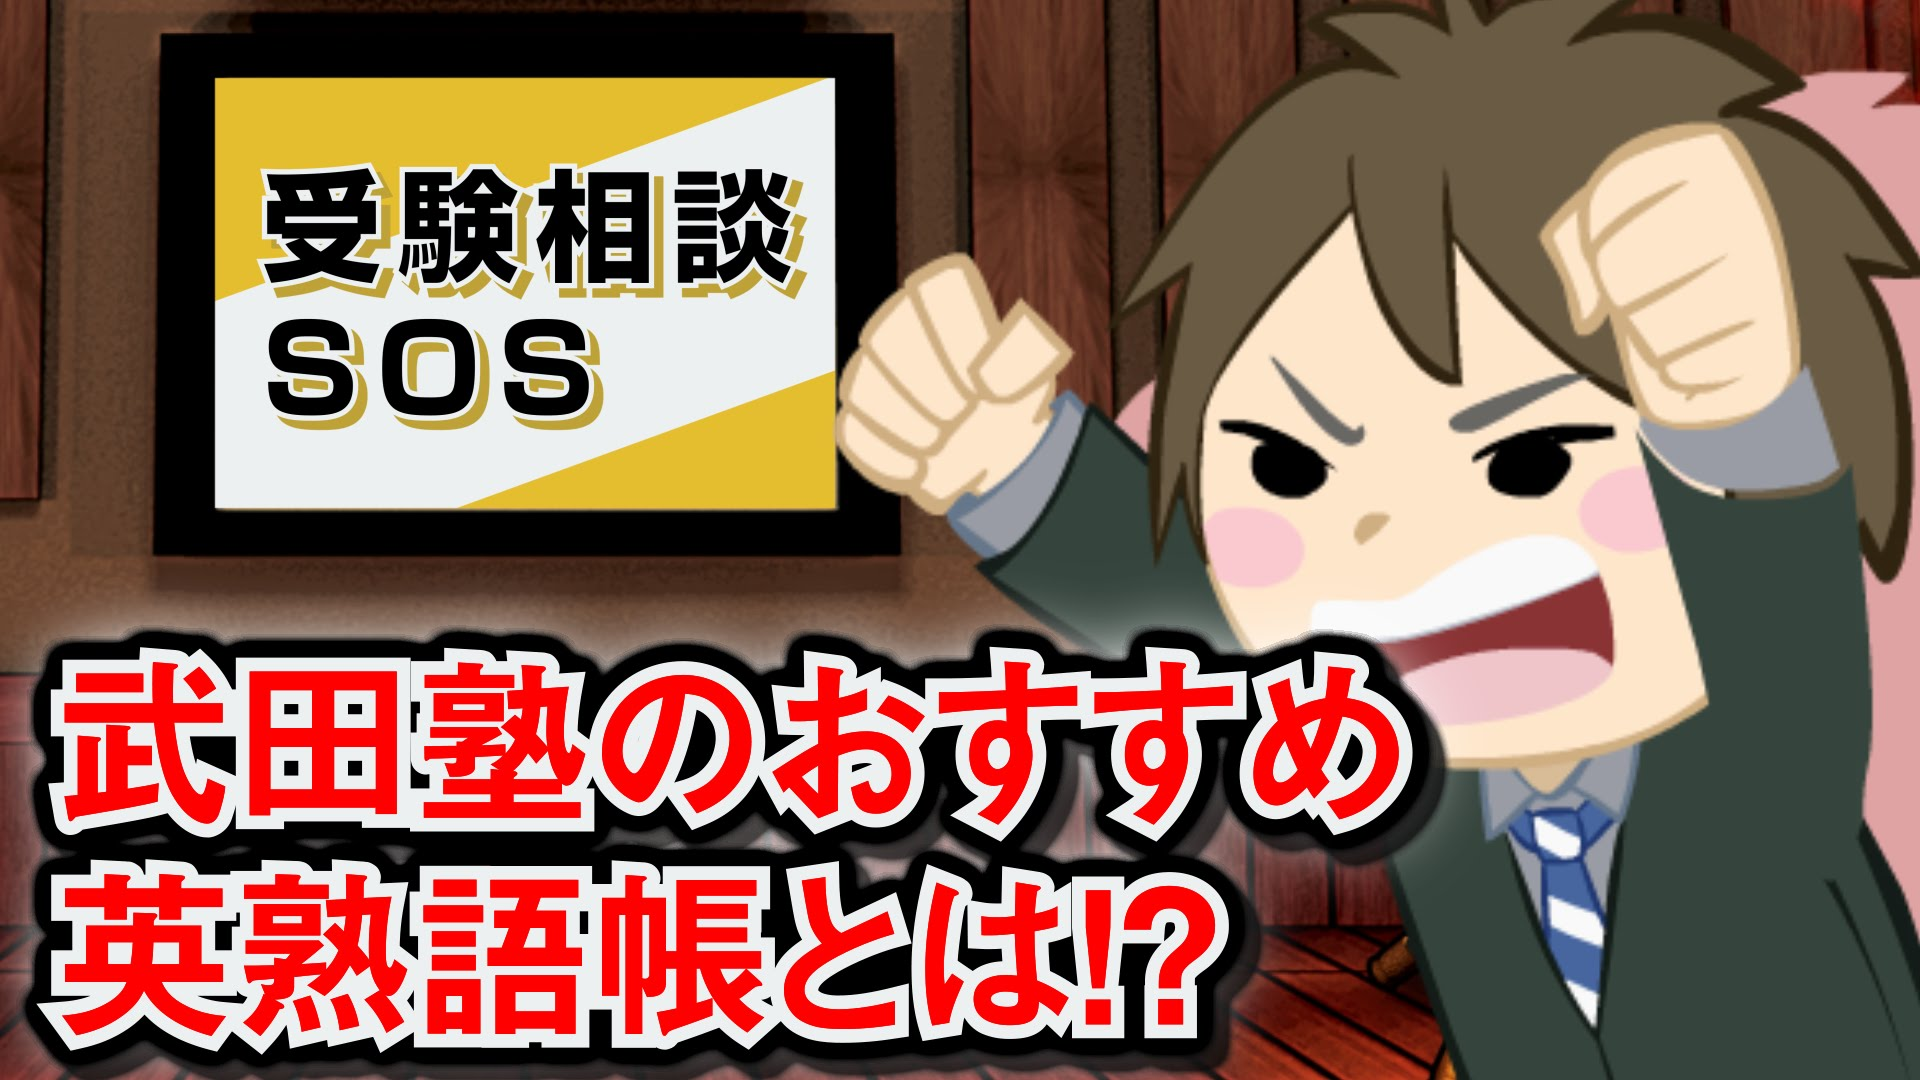 【vol.56】武田塾のおすすめ英熟語帳とは!?|受験相談SOS